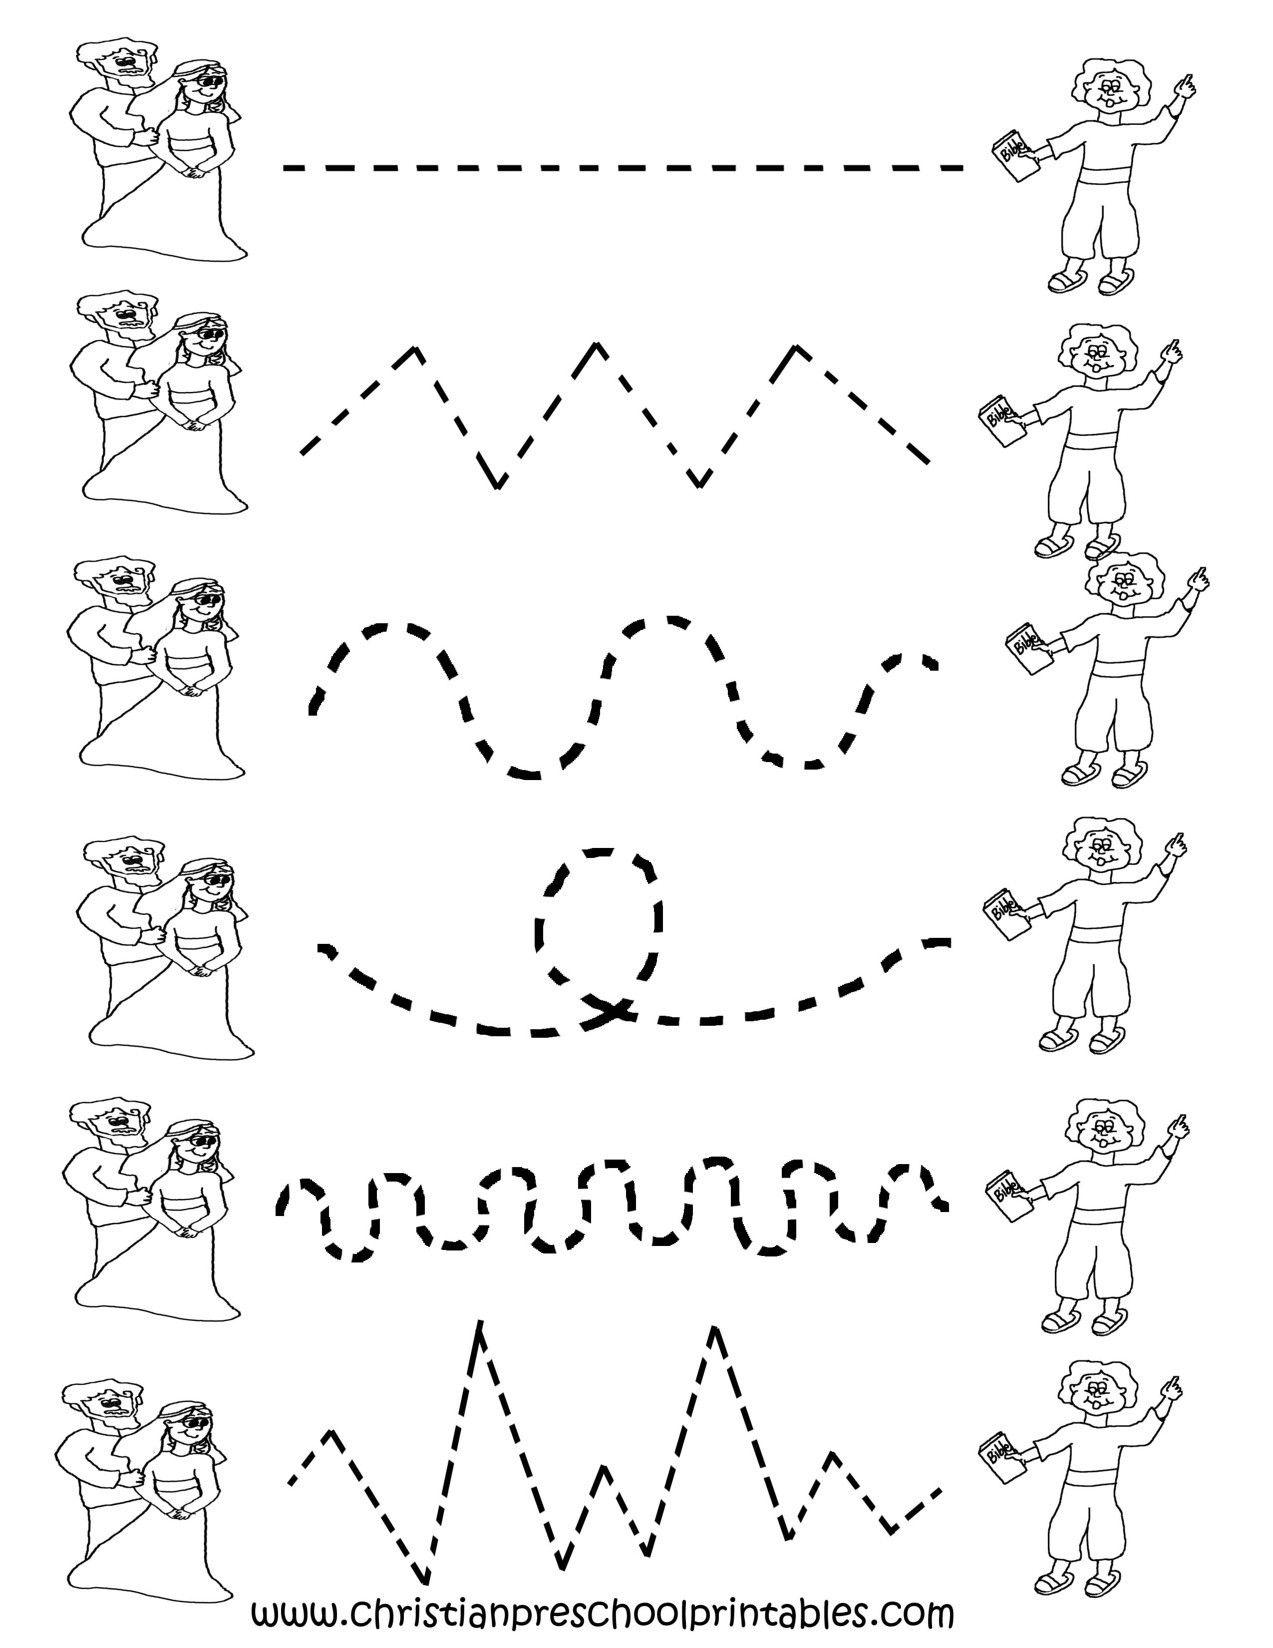 37 Awesome Preschool Worksheets Ideas